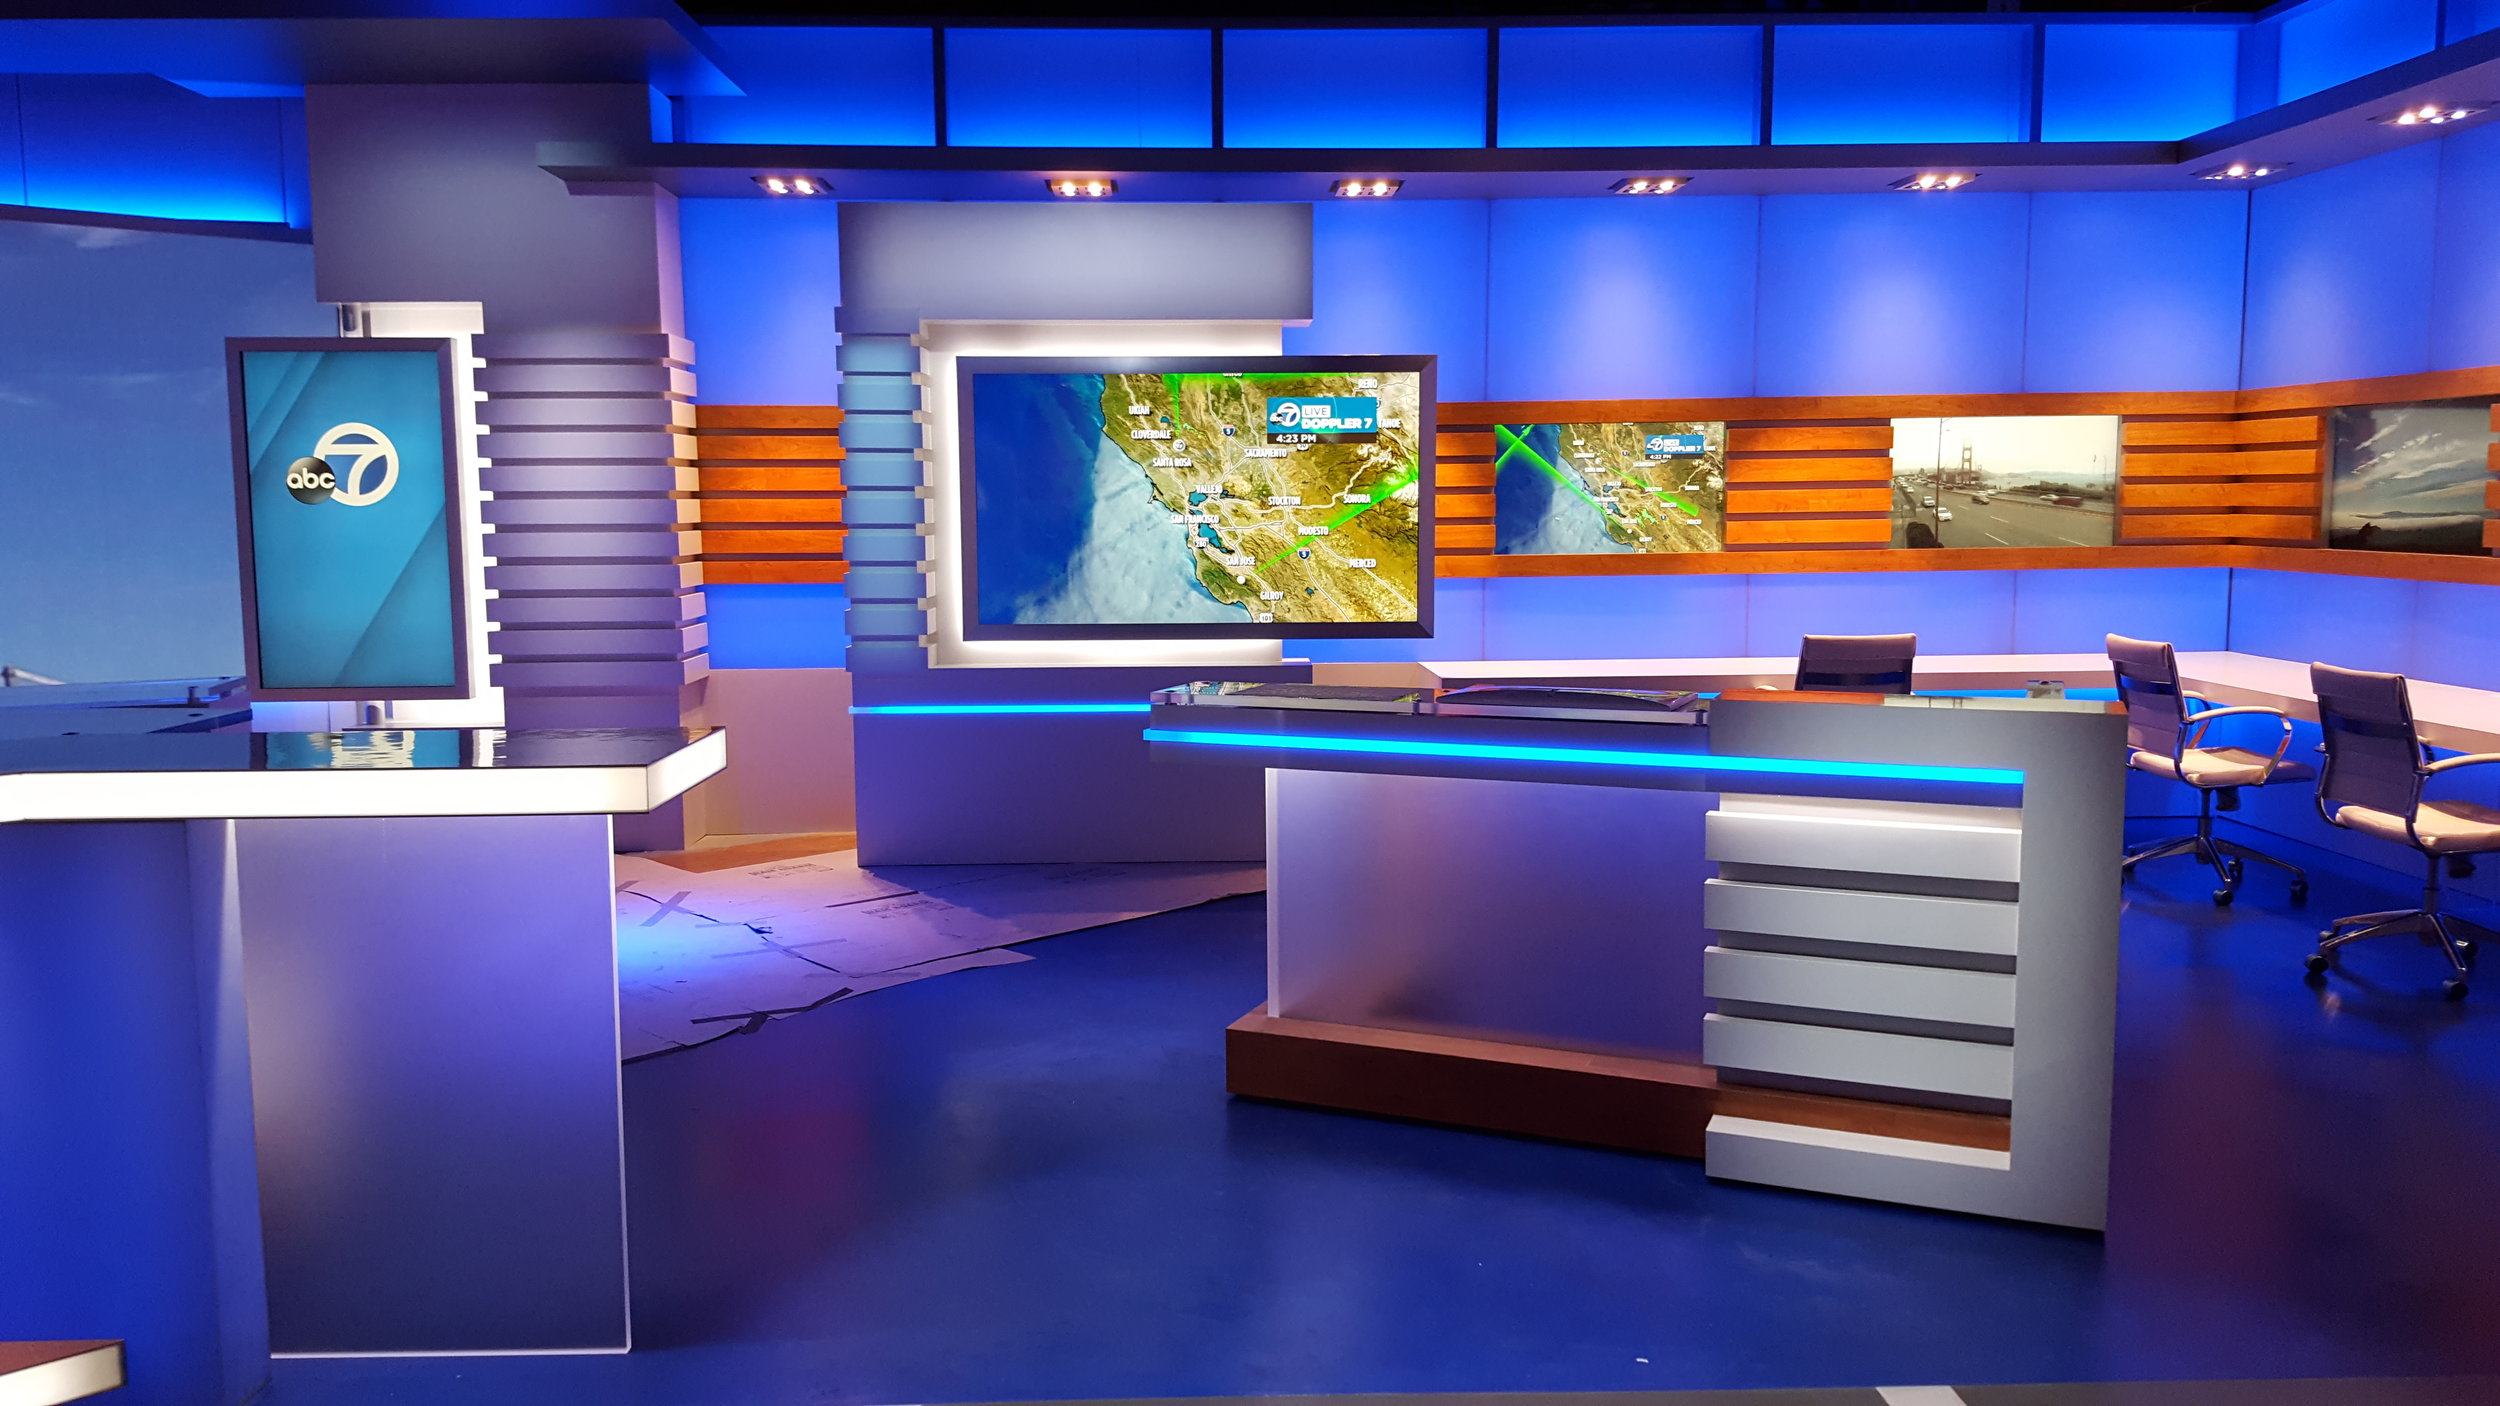 ABC 7 KGO - San Francisco